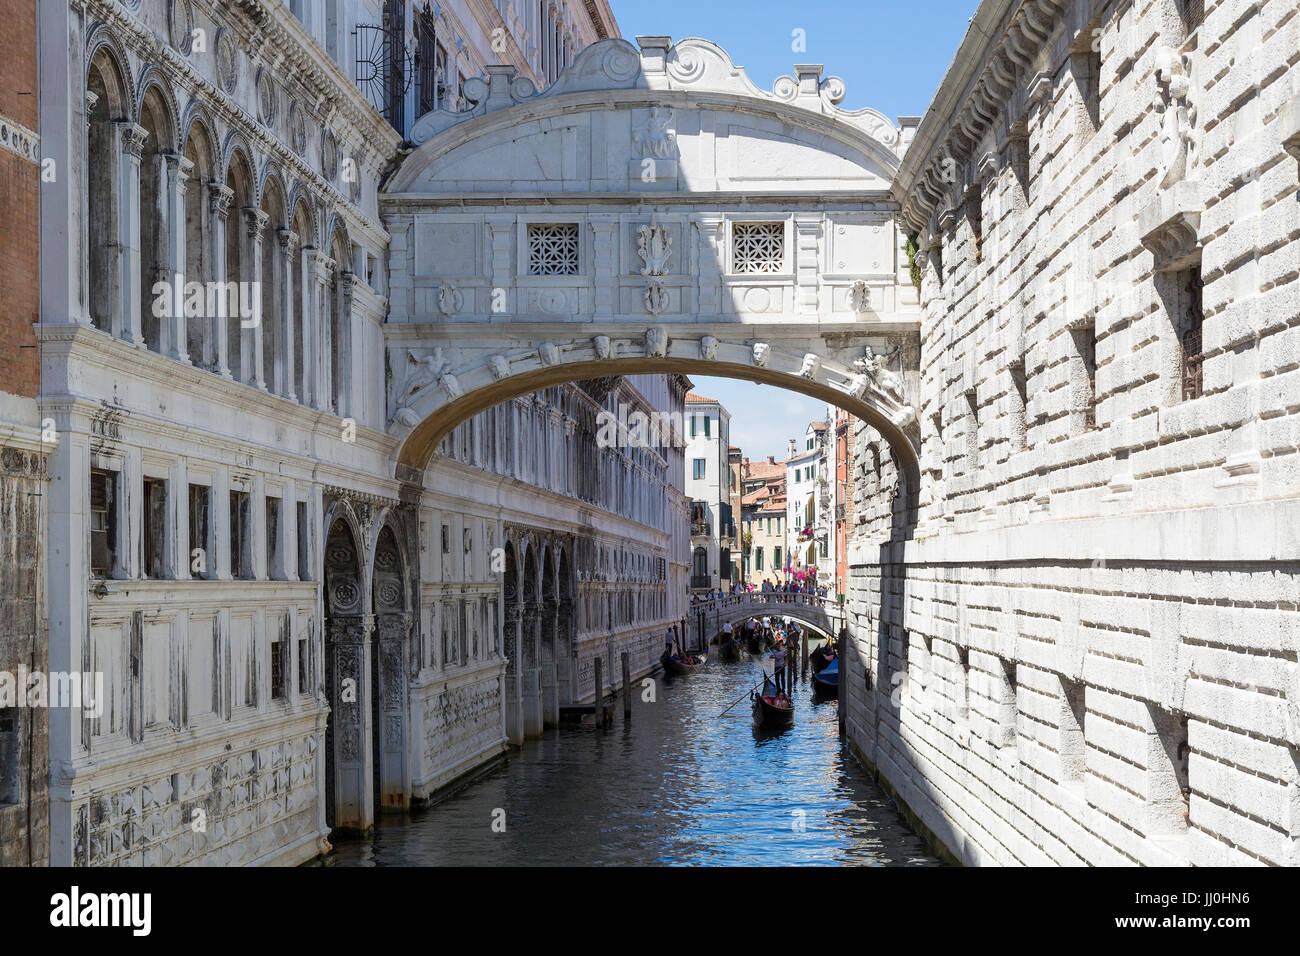 Sigh bridge, Venice, Veneto, Italy - Venice, Venetia, Italy, Seufzerbrücke, Venedig, Venetien, Italien - Venice - Stock Image